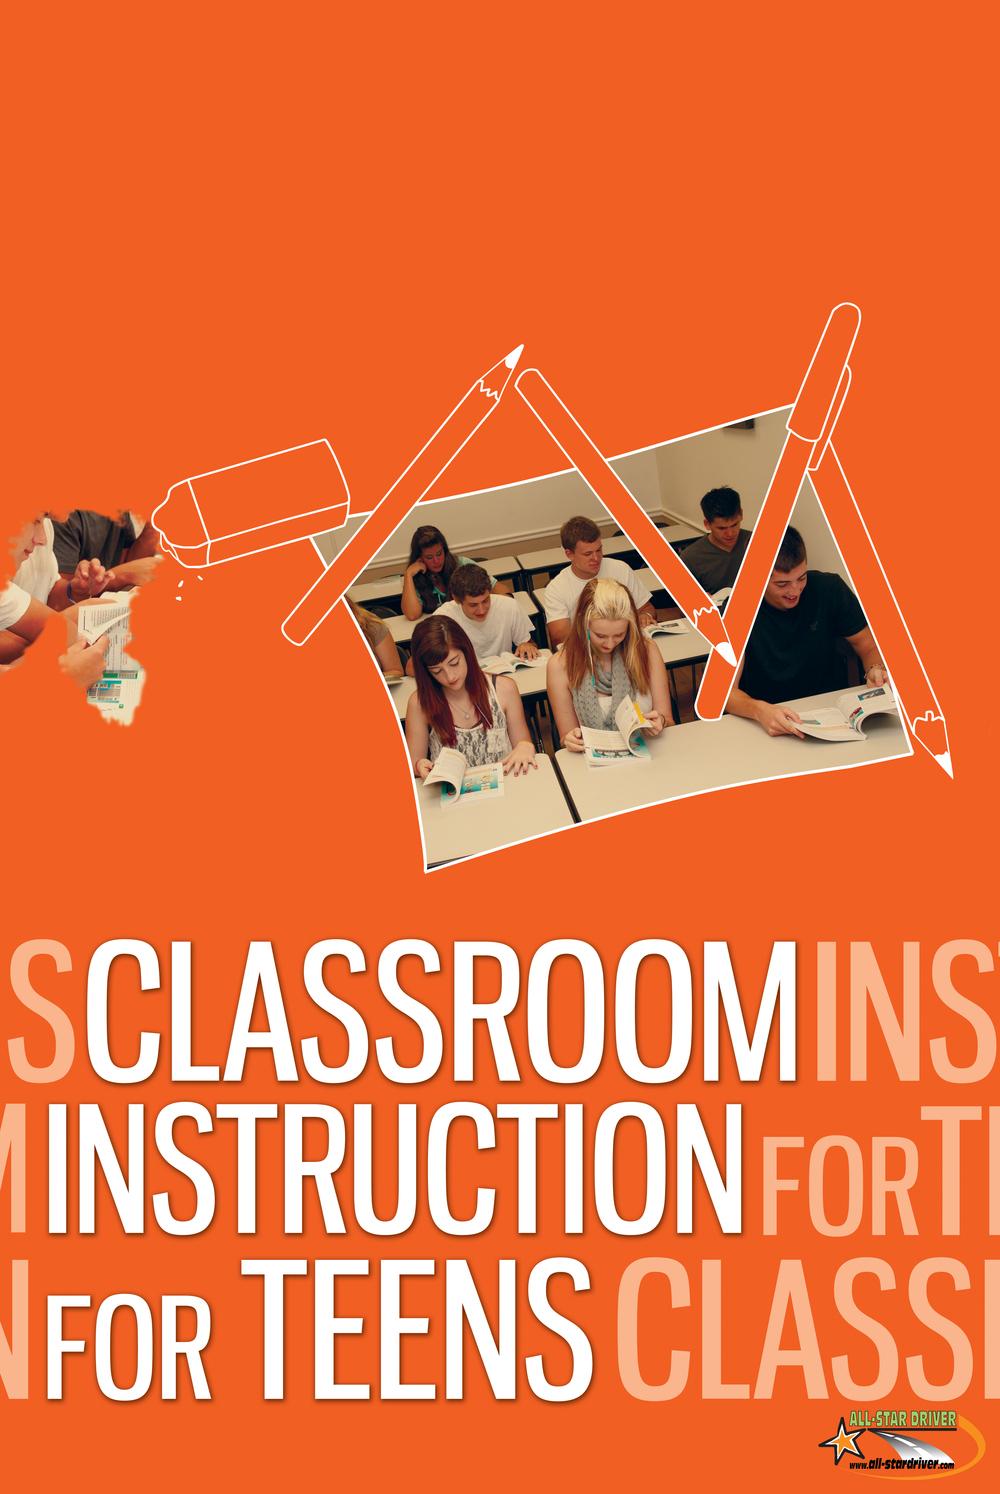 ASD Poster Classroom Instruction for Teens.jpg